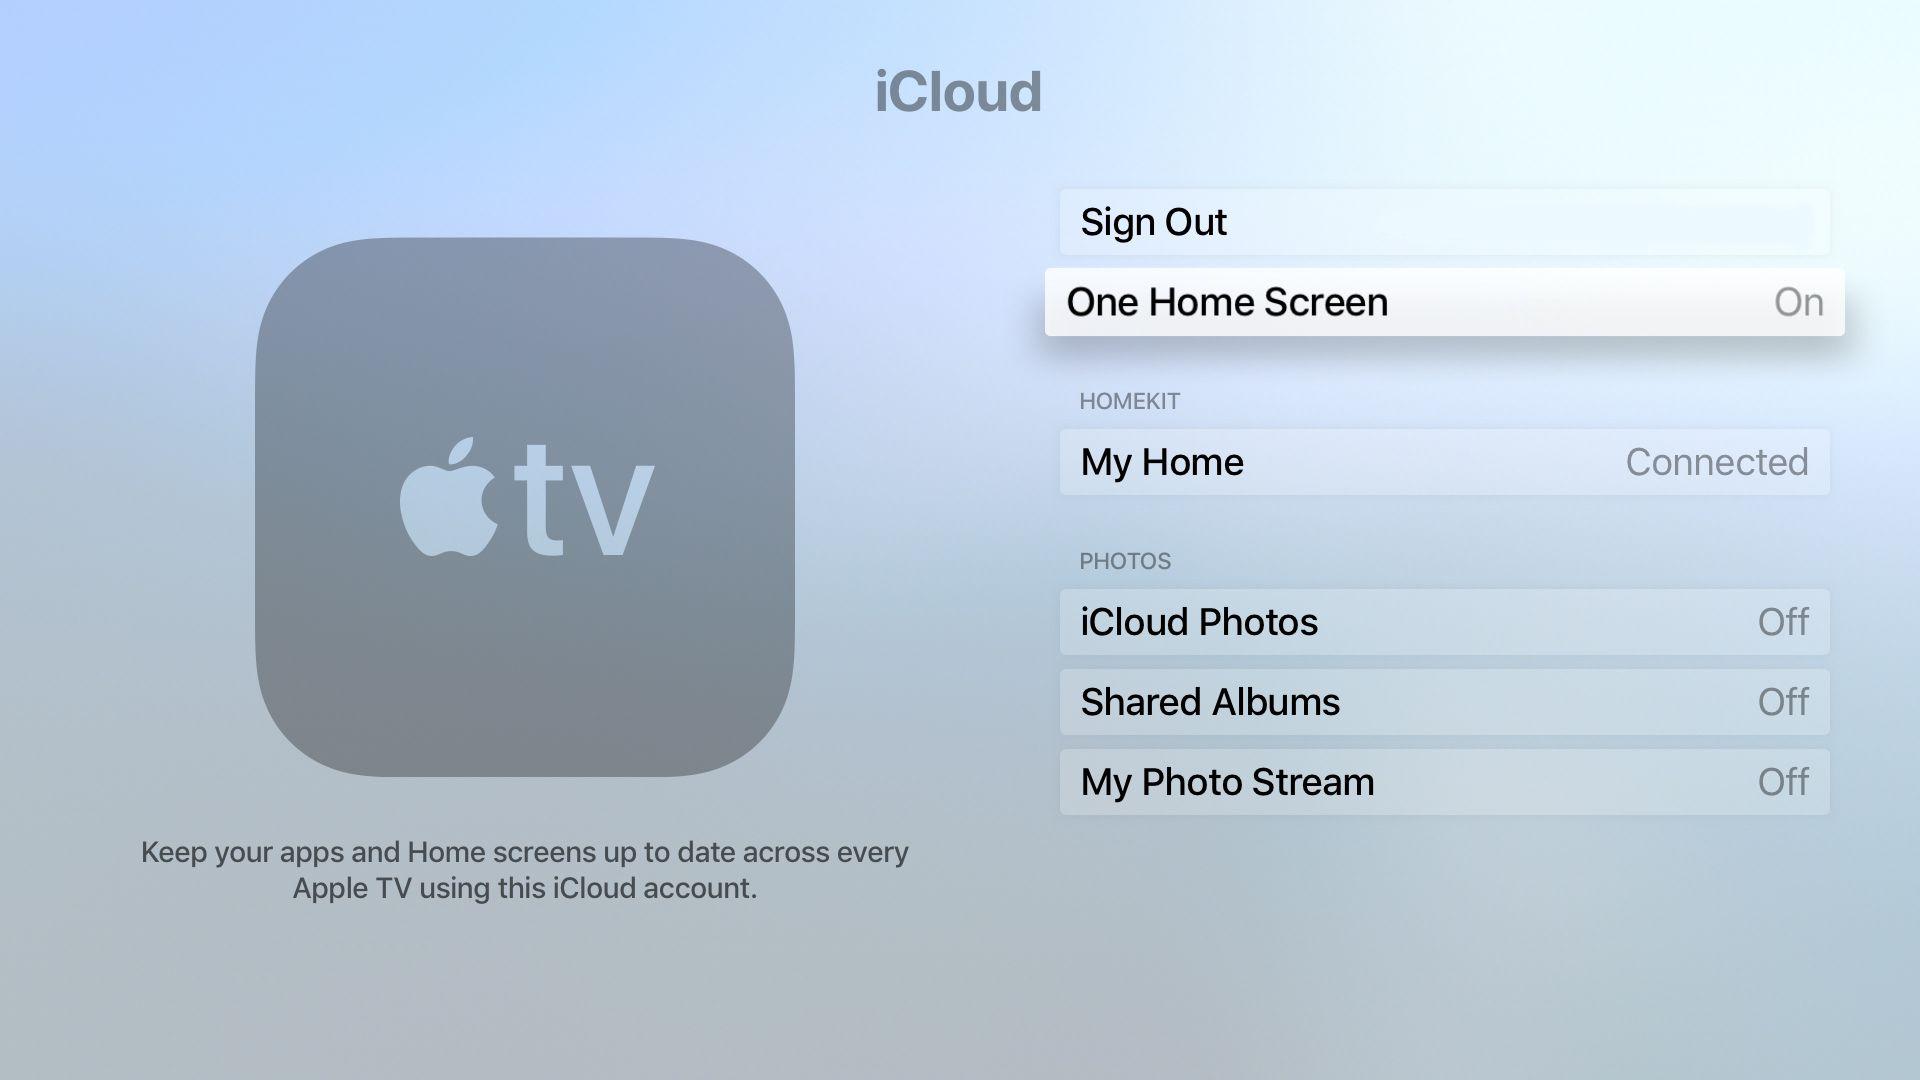 Apple TV one home screen setting